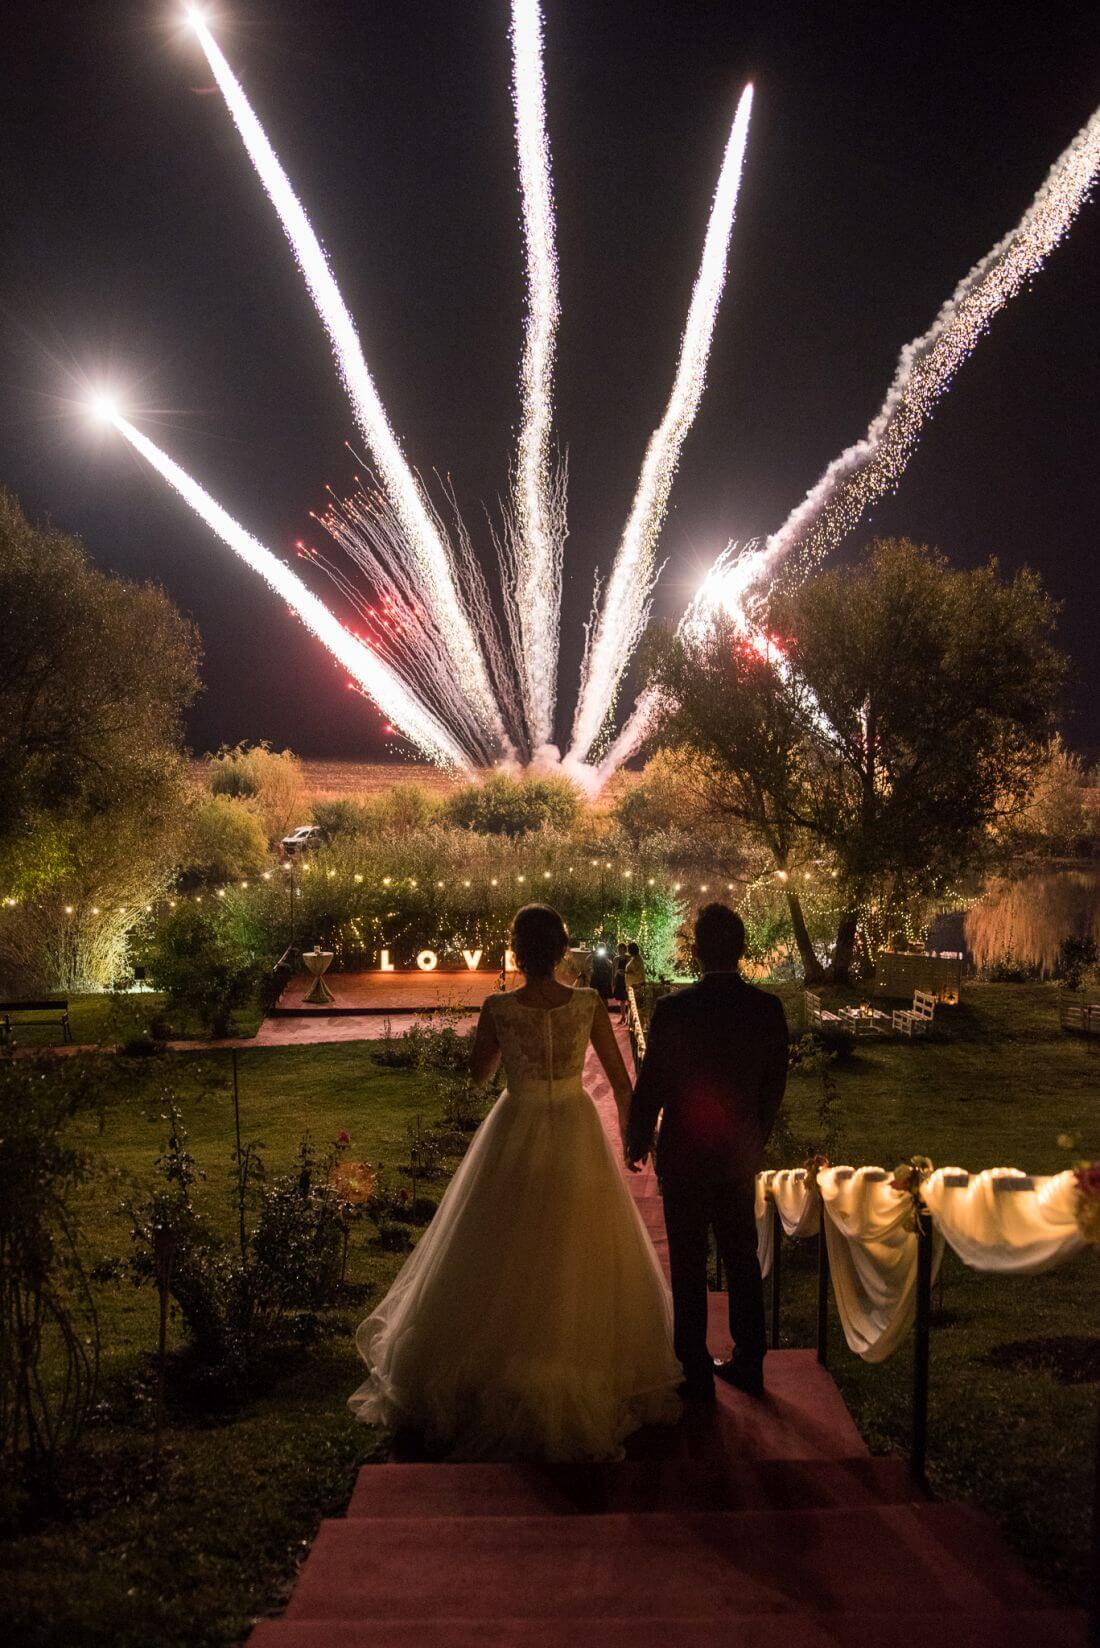 Nunta cu prieteni dragi – Oana si Dani-IDO-Weddings-nuntiinaerliber (15)